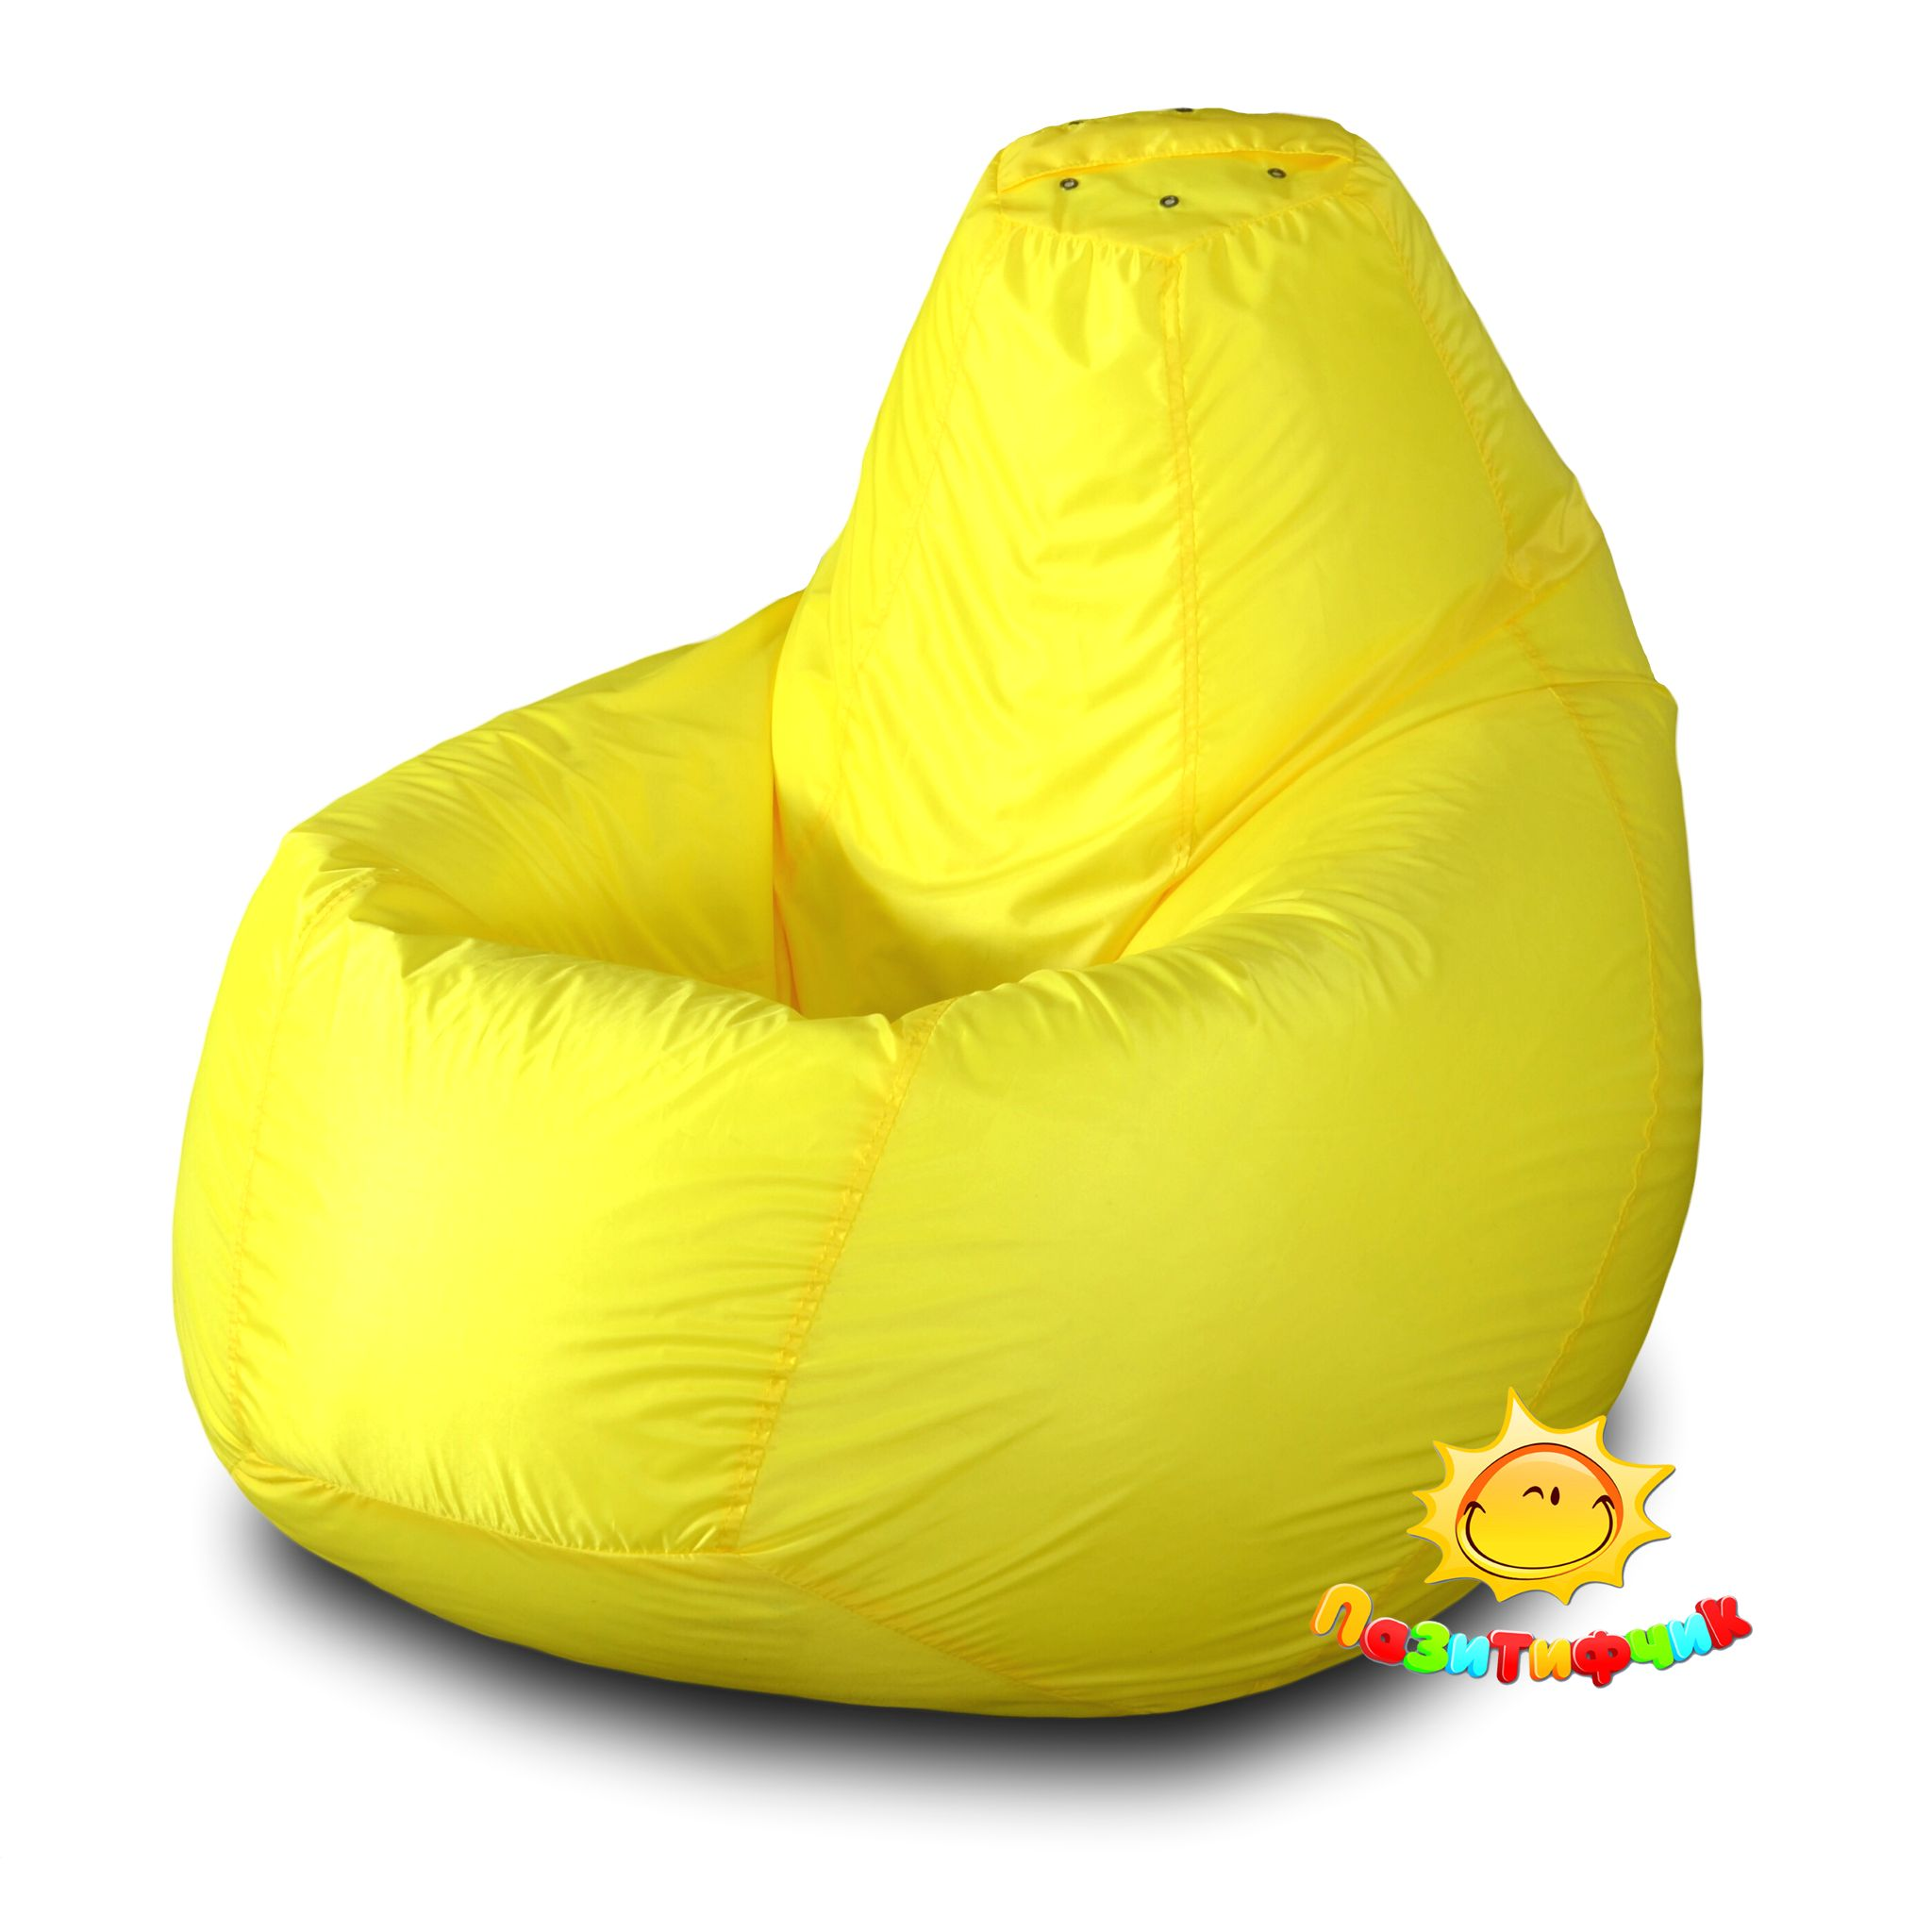 Кресло-мешок Pazitif Груша Пазитифчик Оксфорд, размер XL, оксфорд, желтый